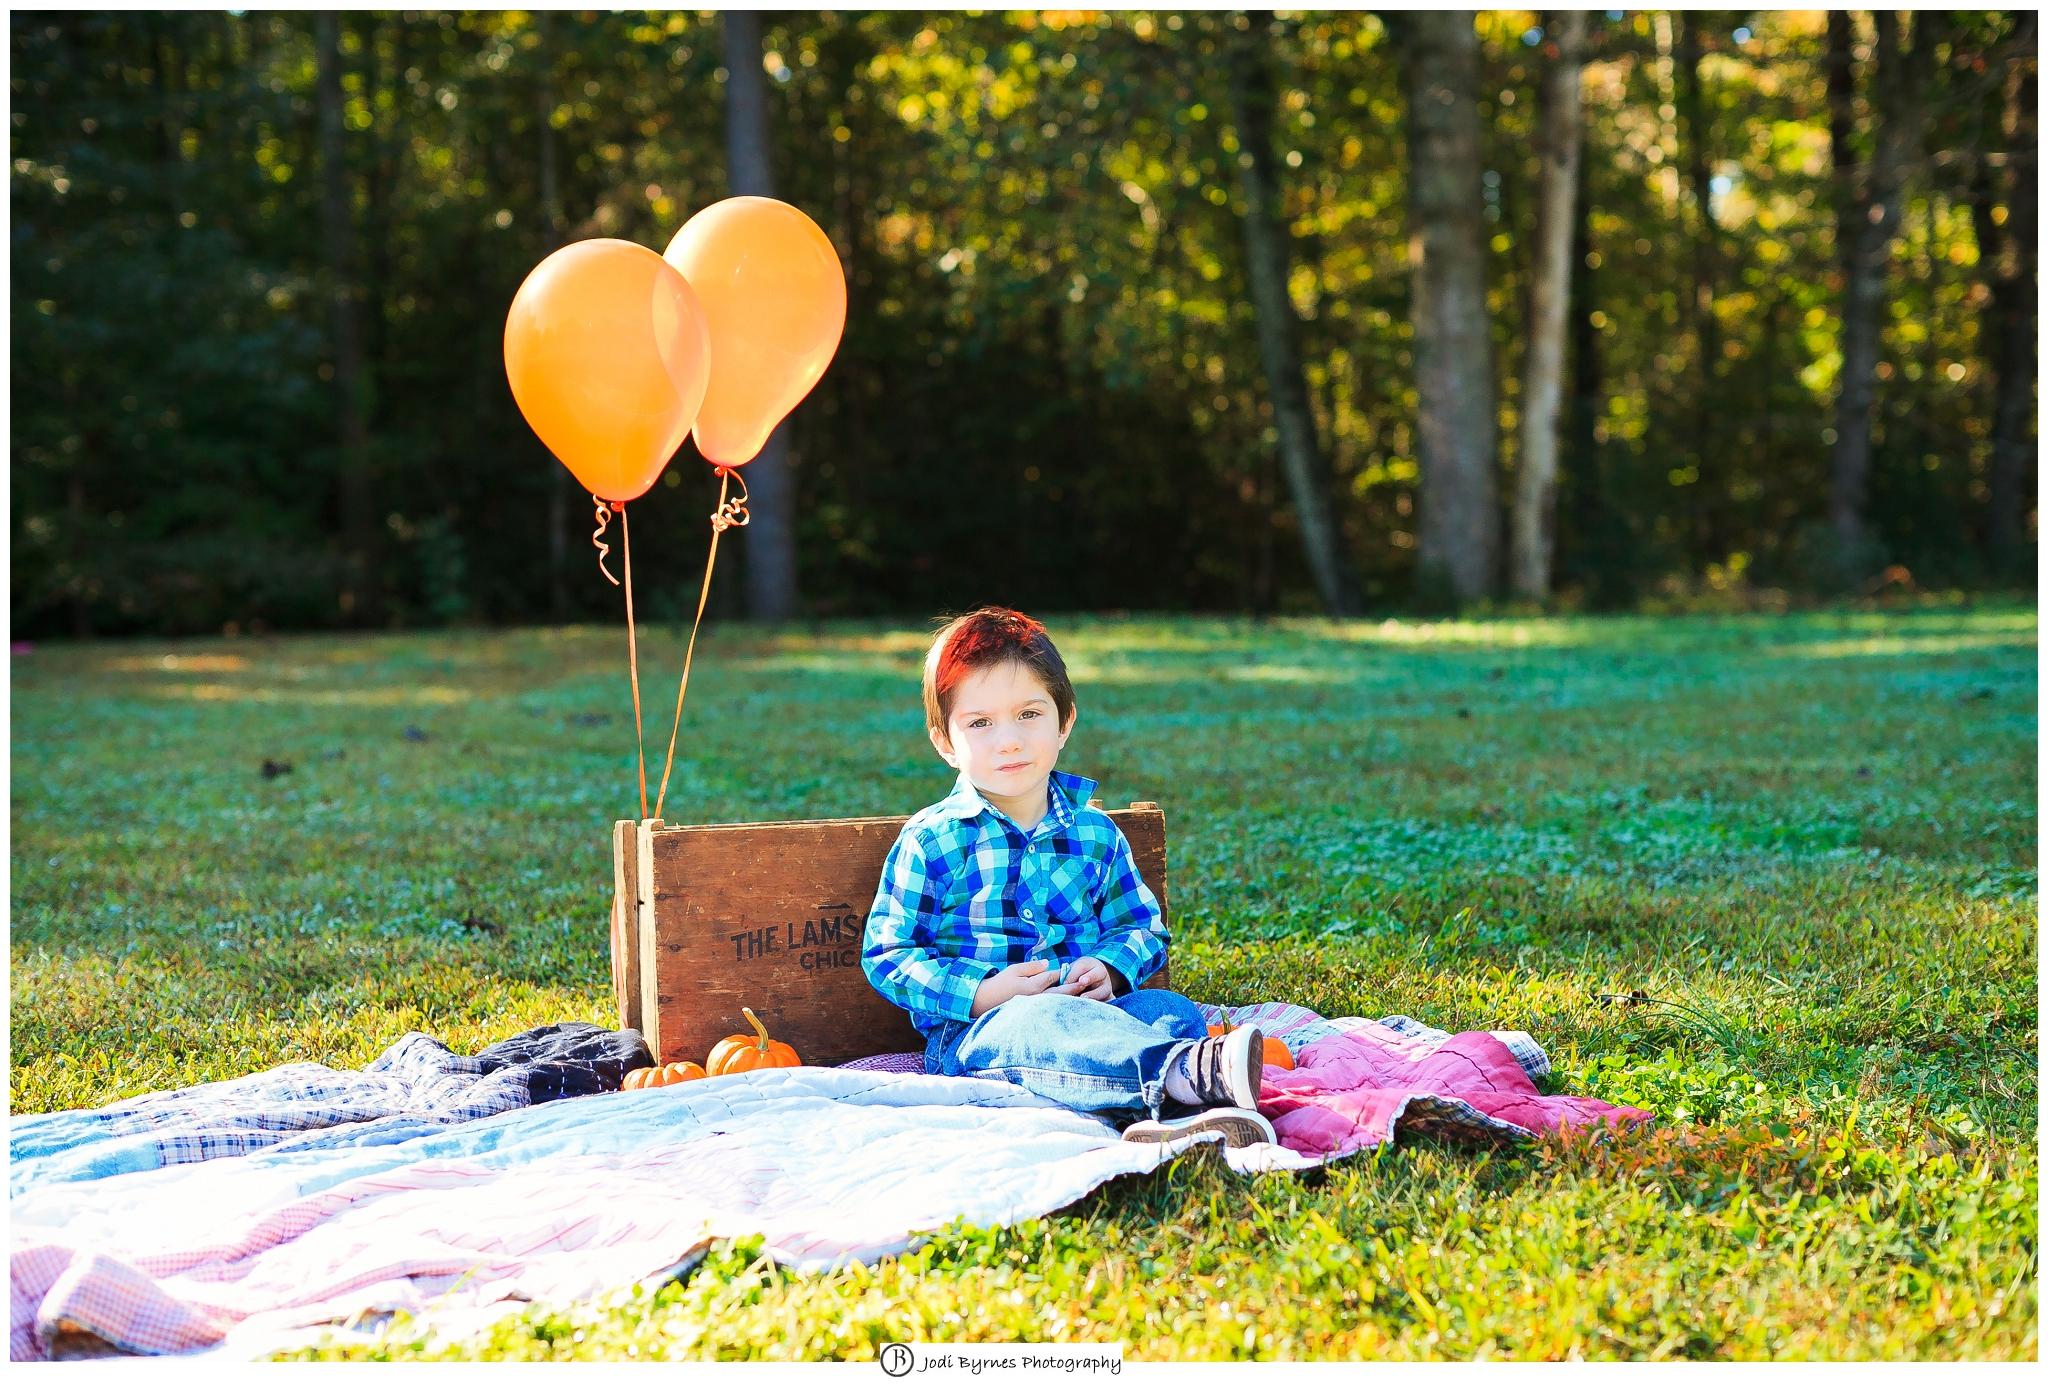 park balloons boy picture